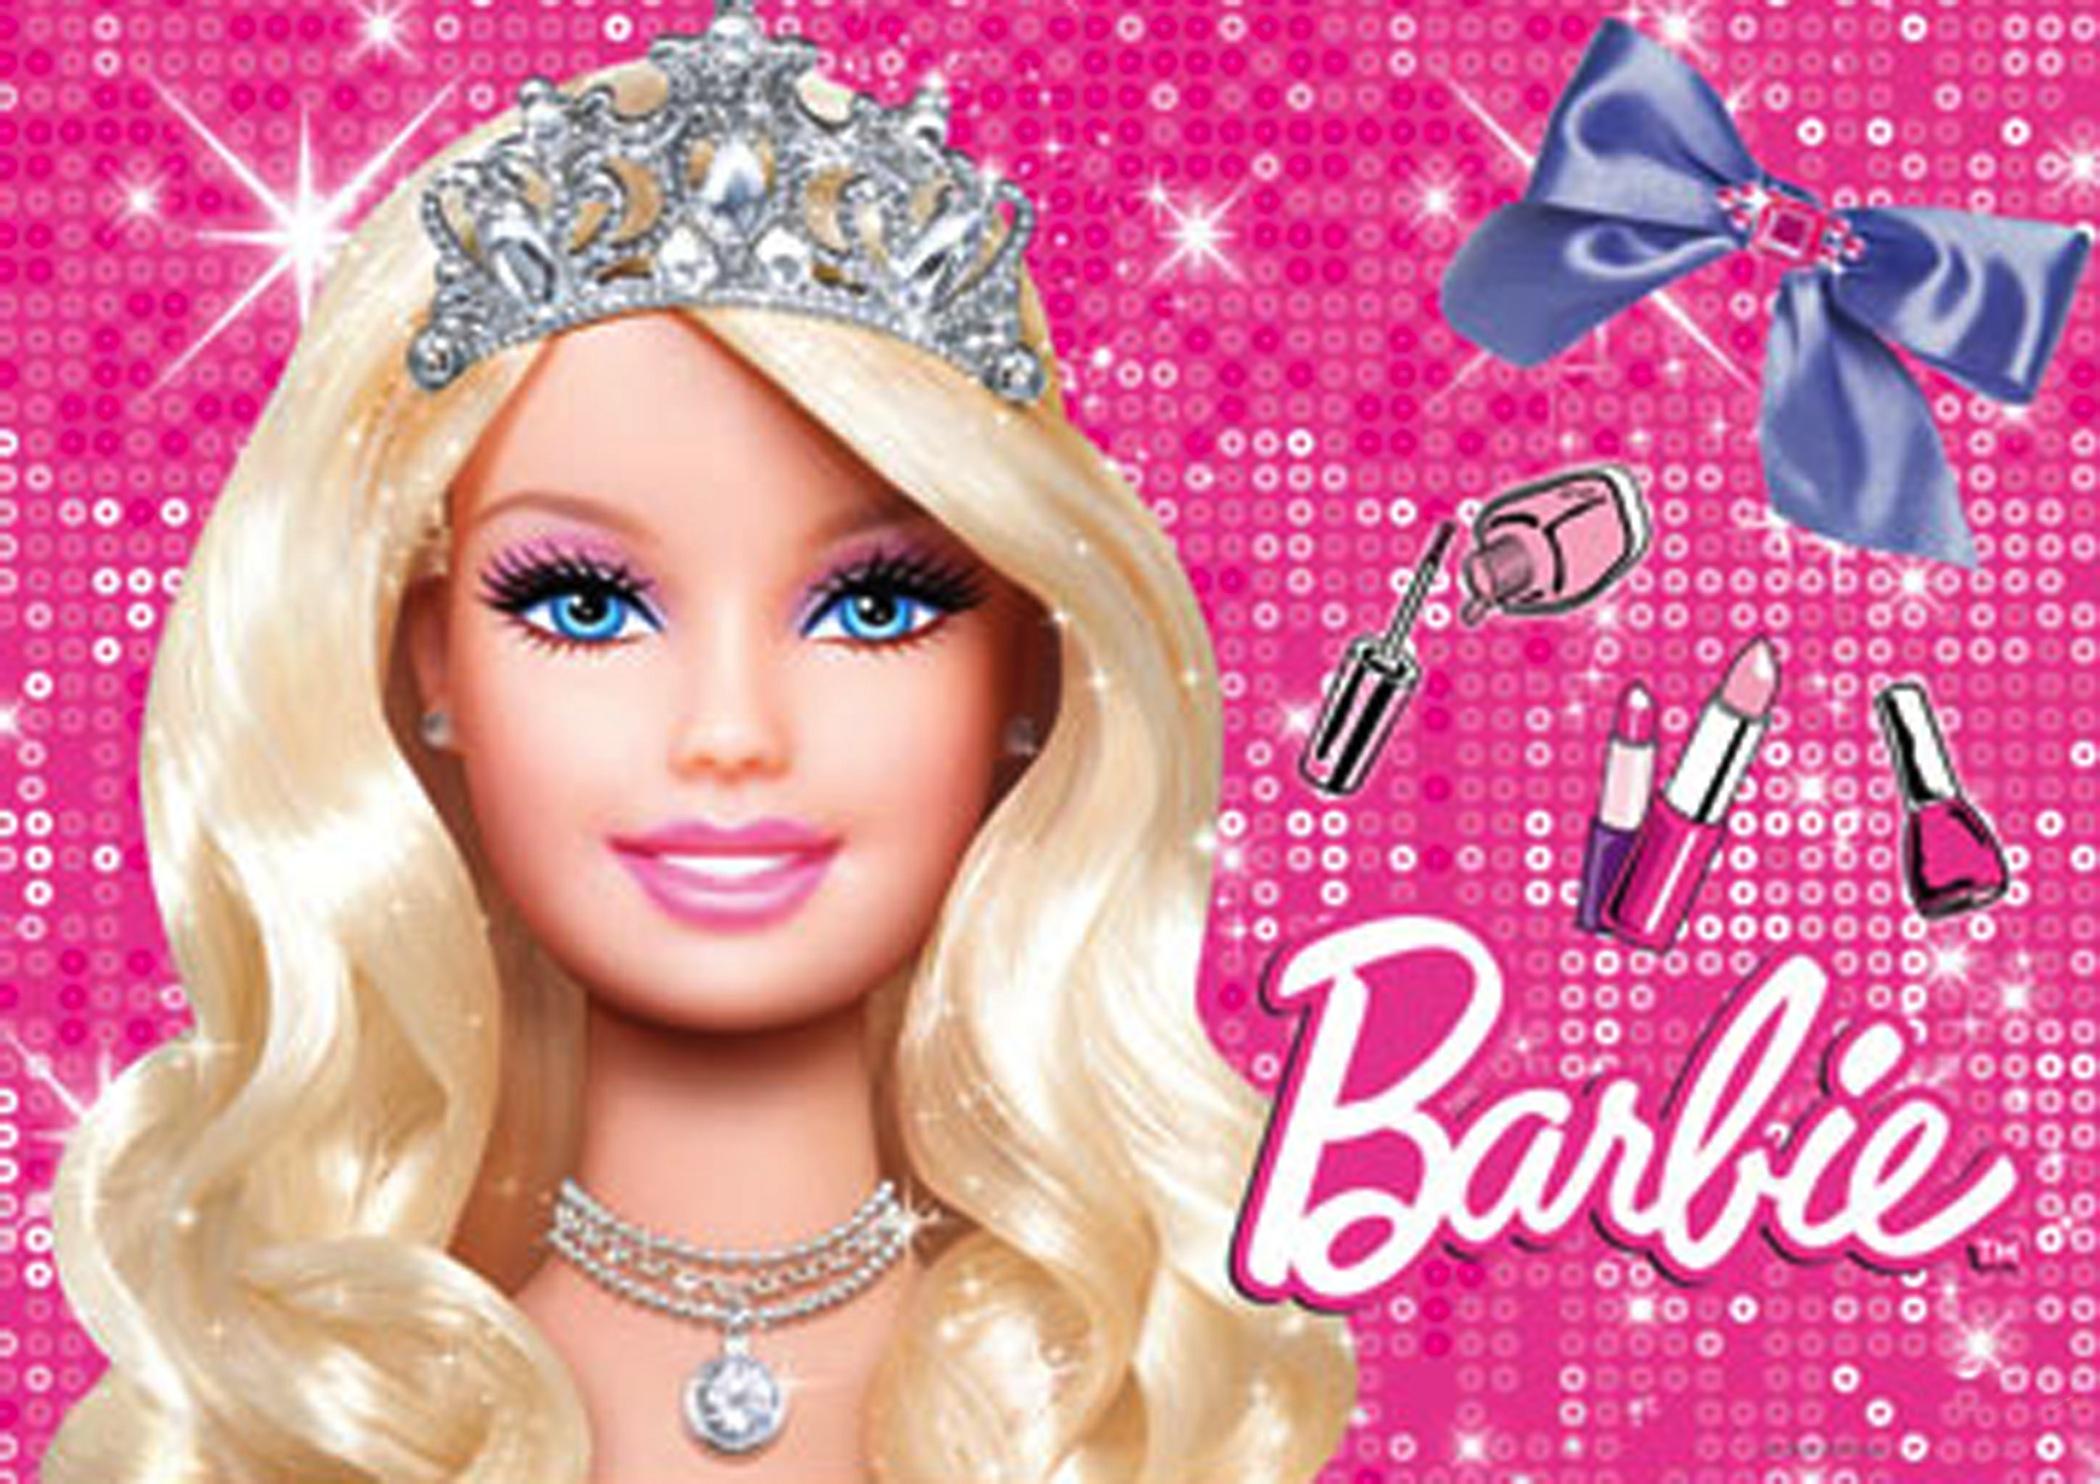 Juegos de Barbie para chicas argentina